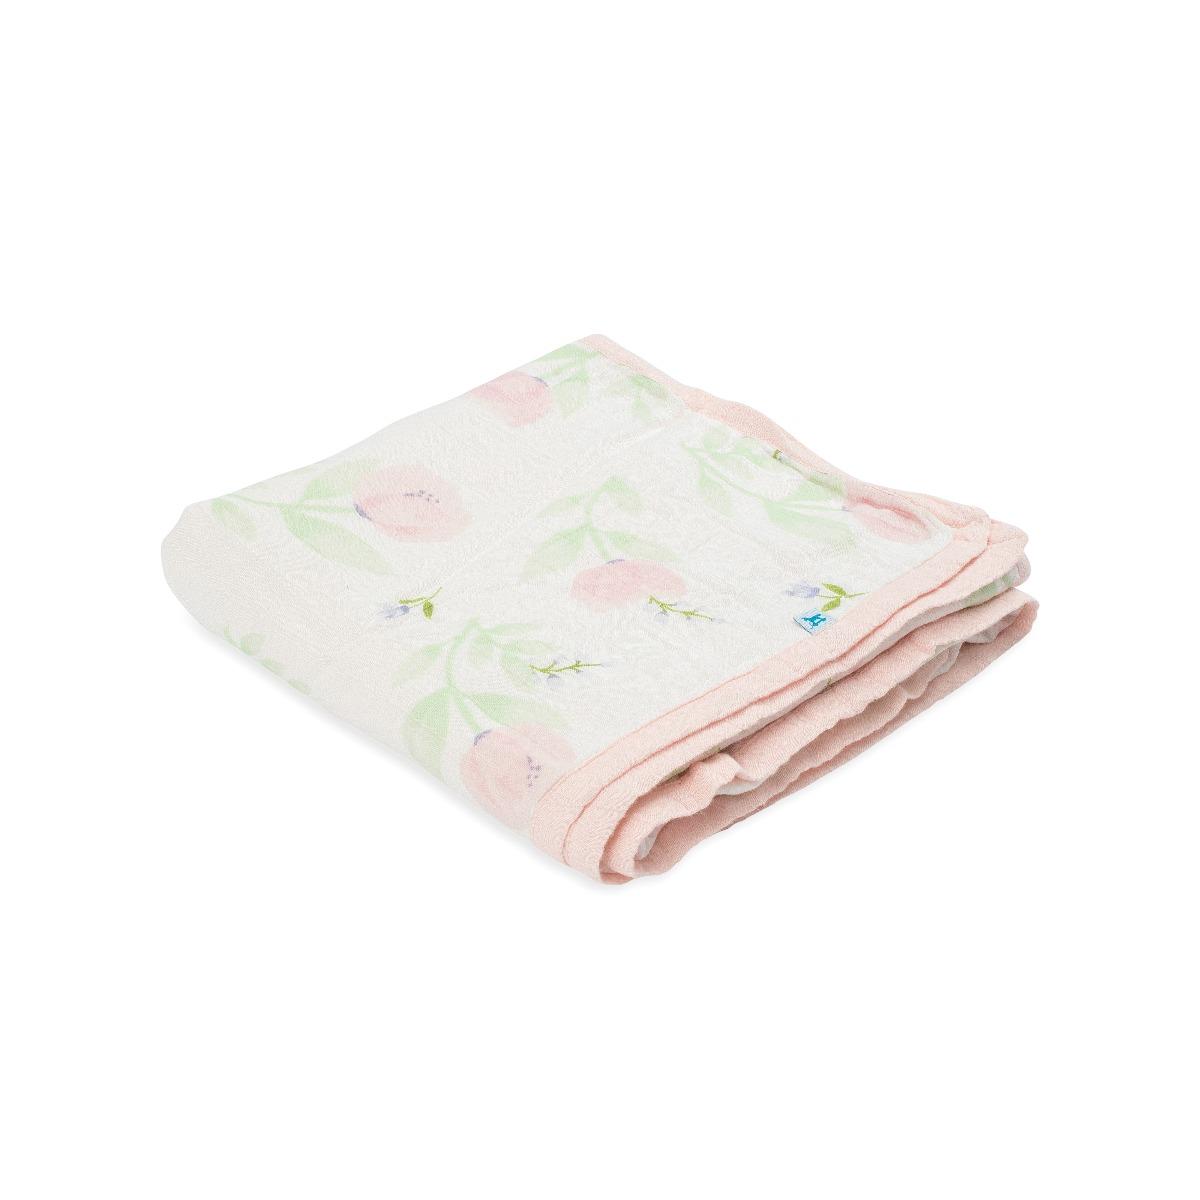 Little Unicorn Deluxe Muslin Quilt Pink Peony